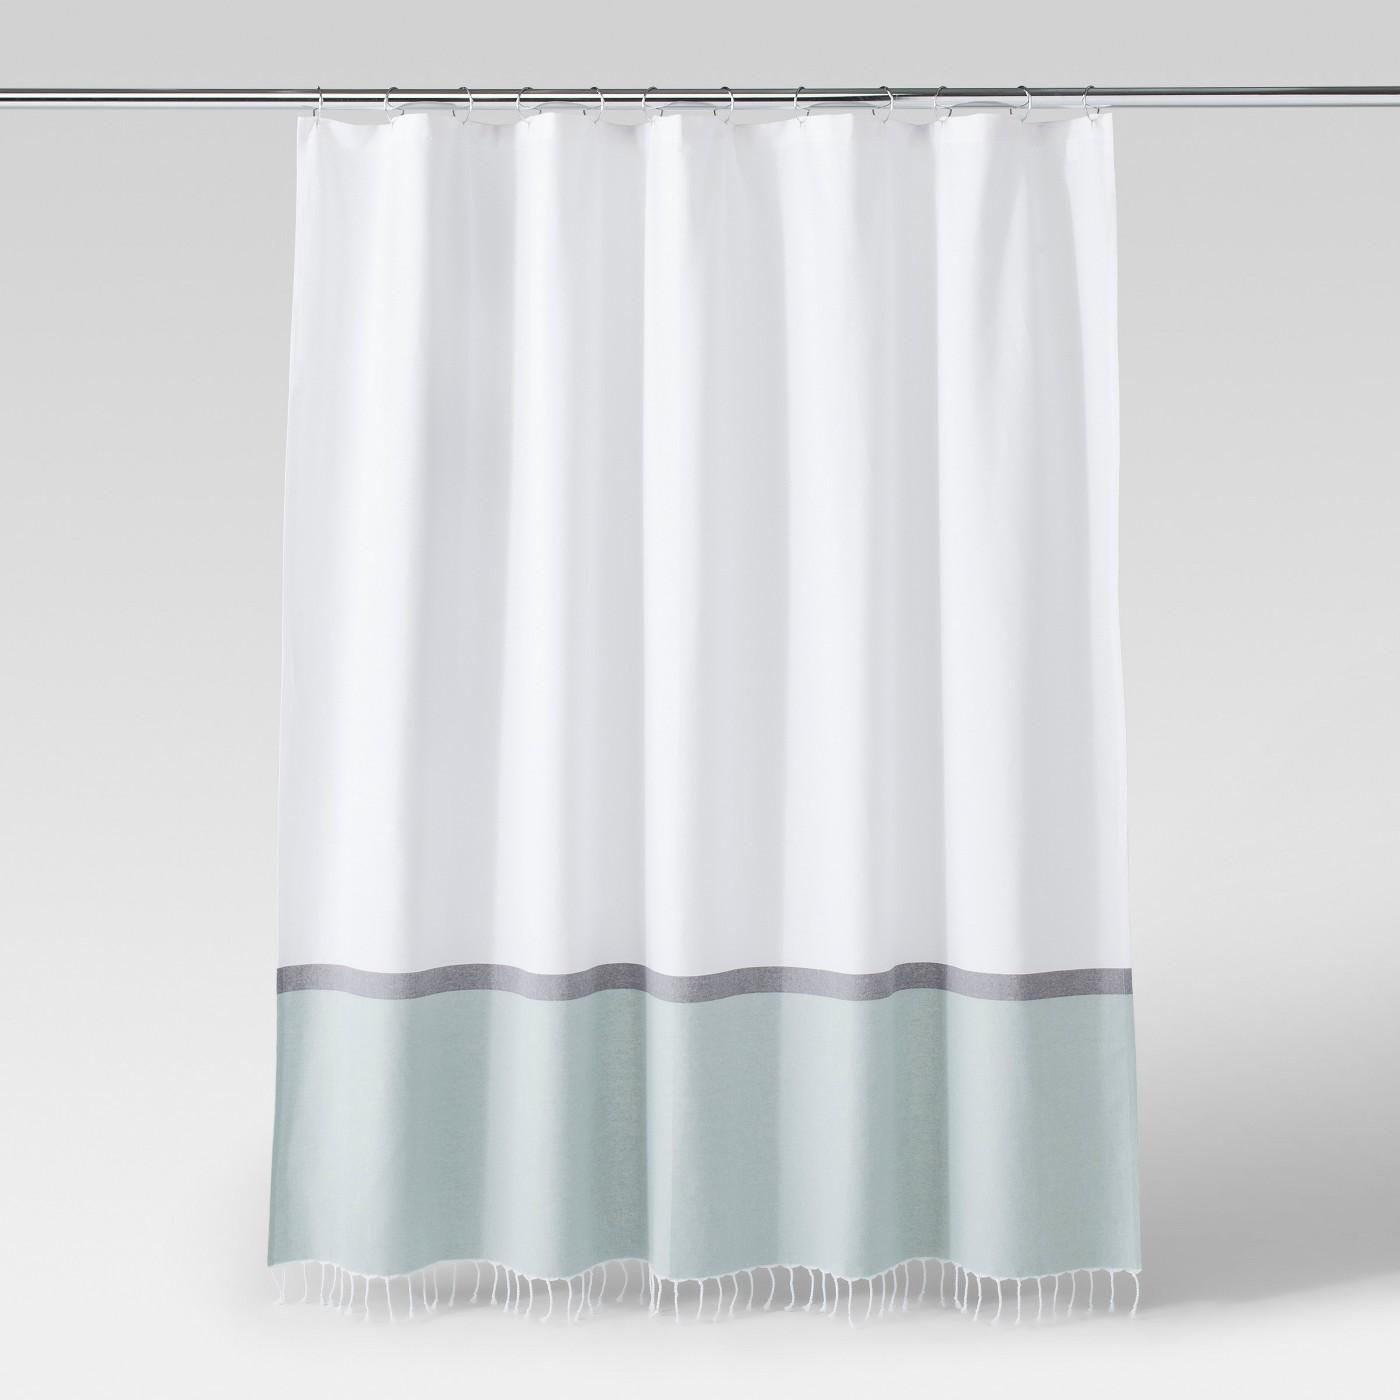 Curtain (similar)